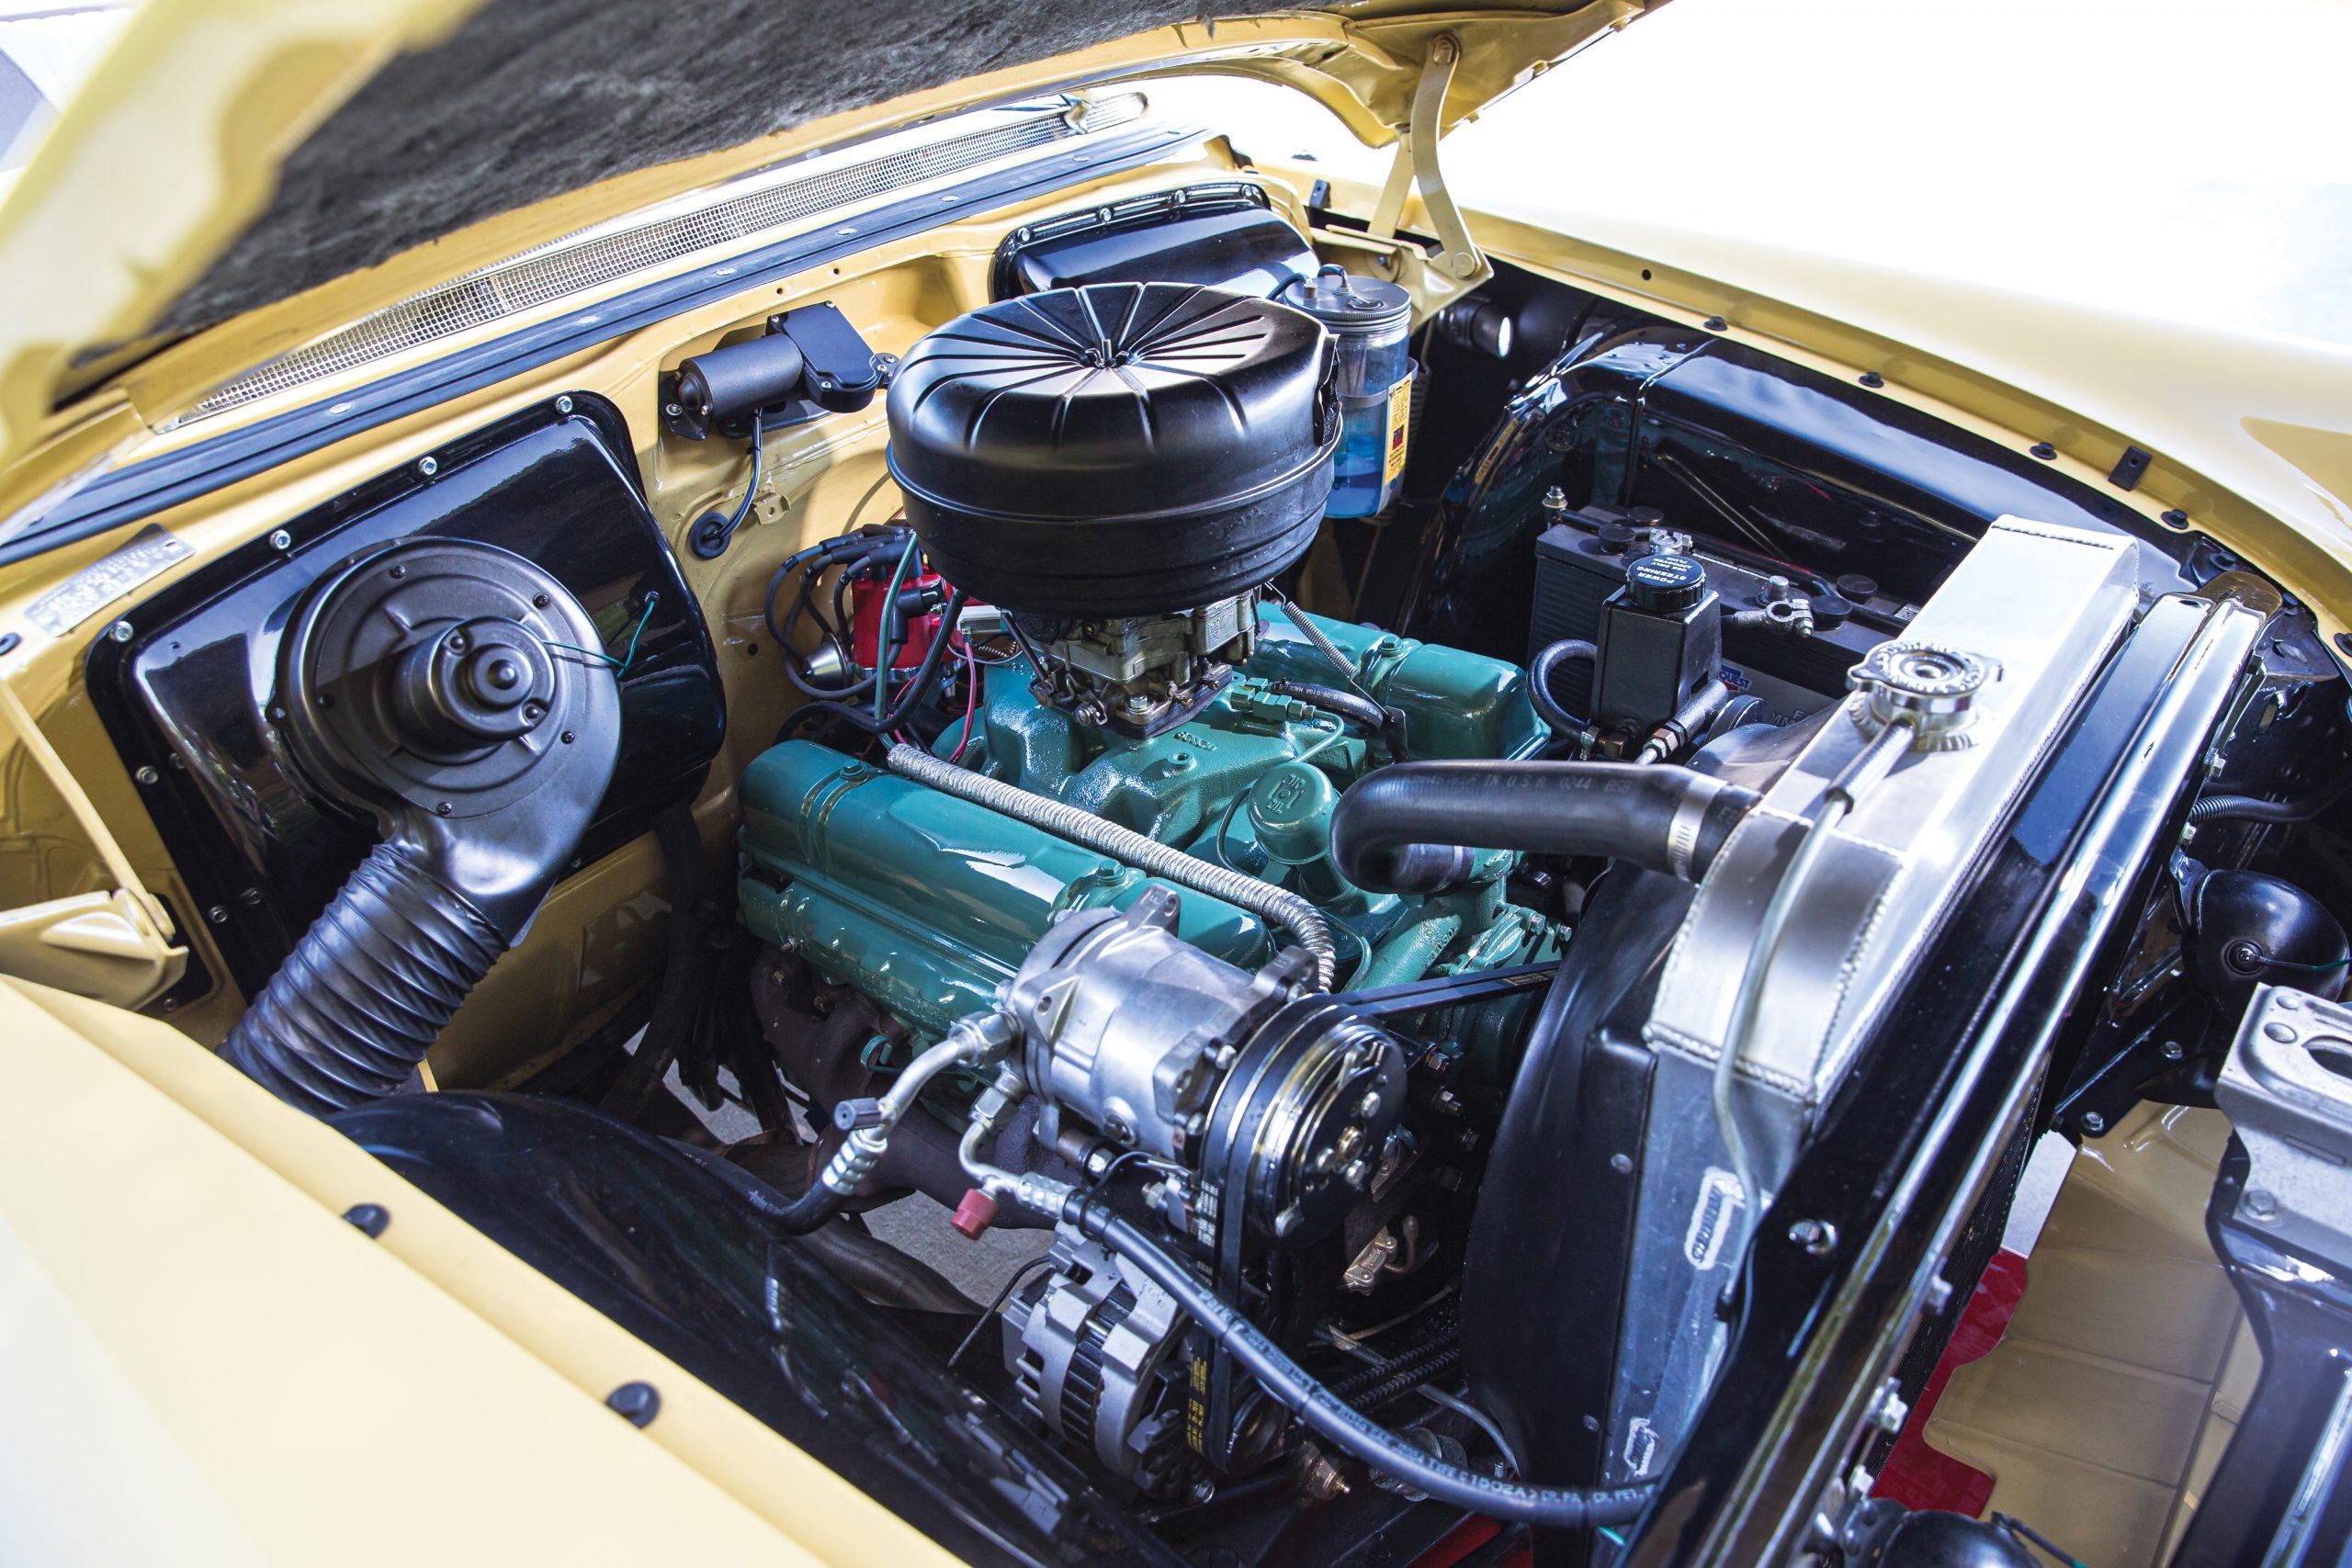 1954 Buick Roadmaster Convertible engine